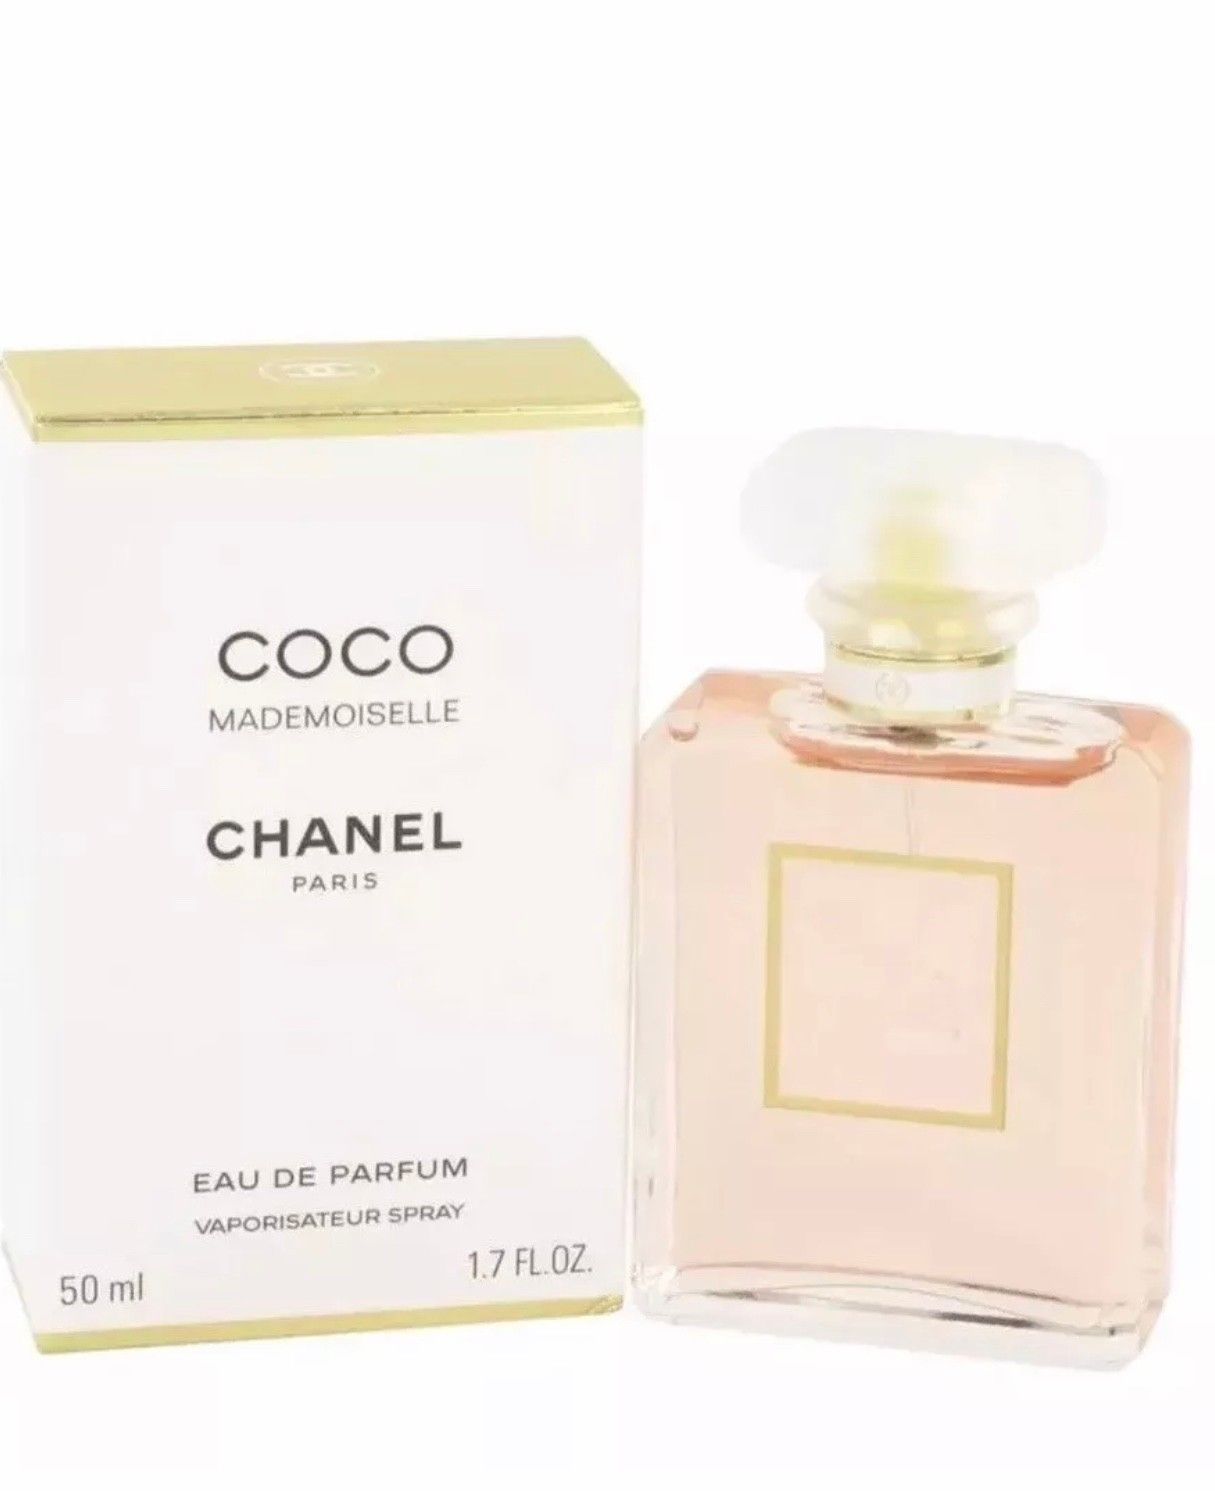 808f2c09 Chanel Coco Mademoiselle 3.4 oz Women's EDP Spray Brand New SEALED ...